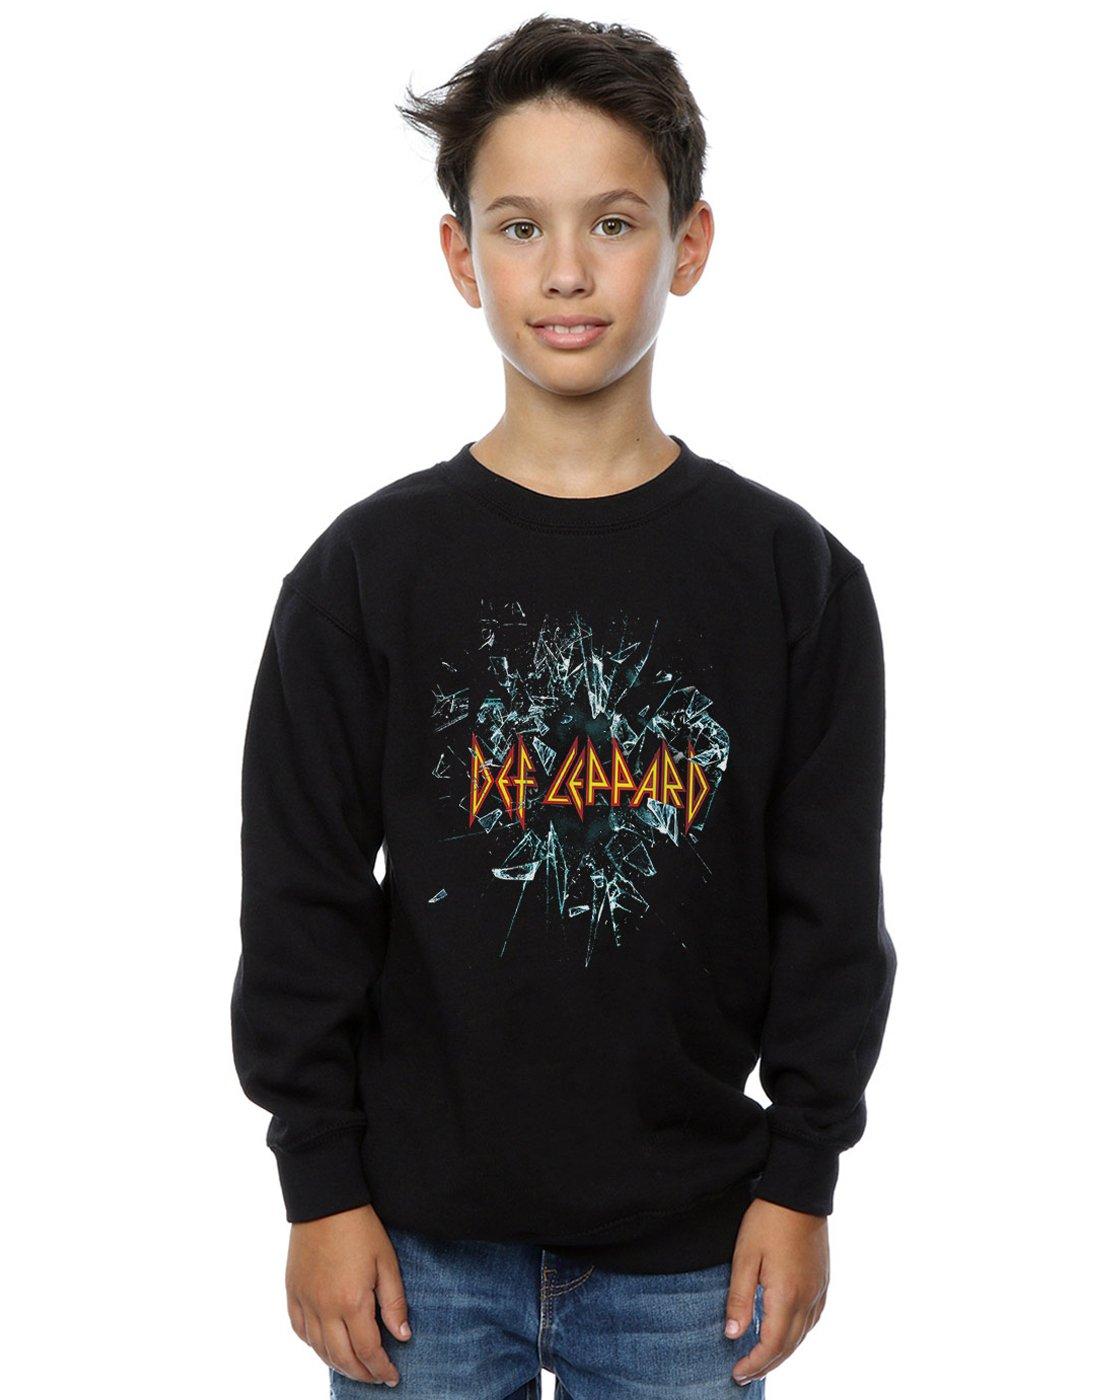 Absolute Cult Def Leppard Boys Glass Shatter Sweatshirt Black 7-8 Years